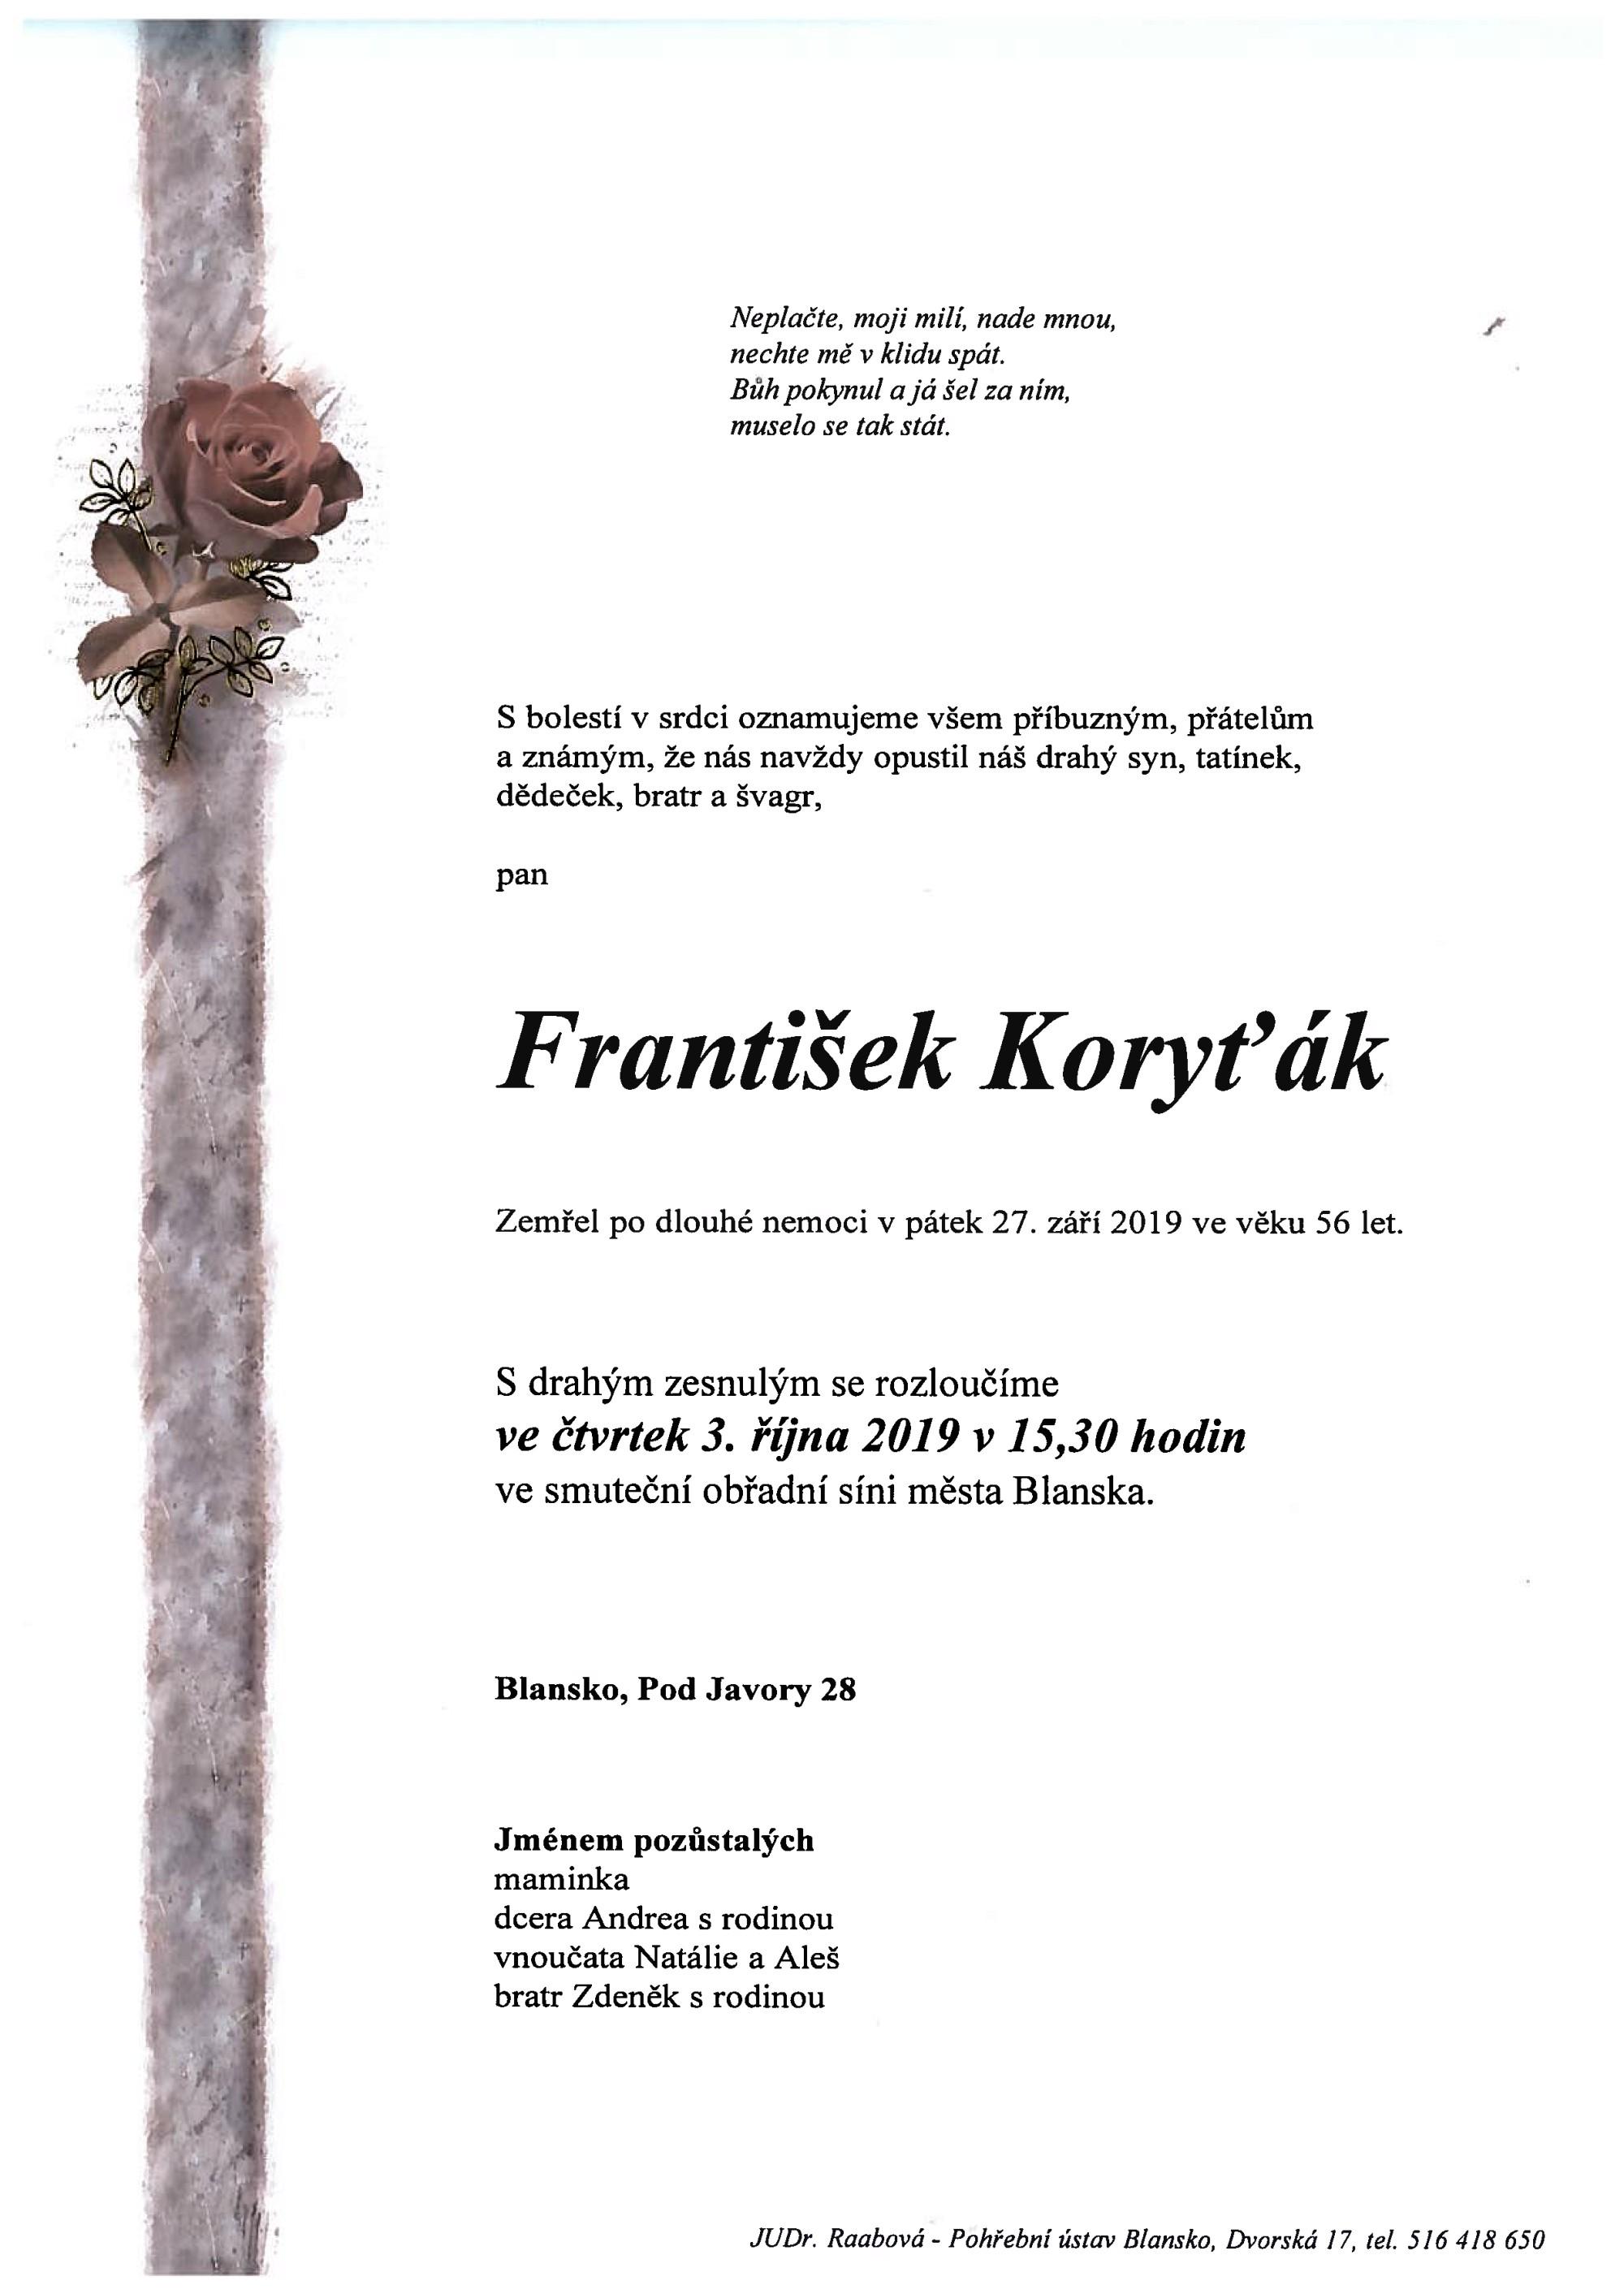 František Koryťák